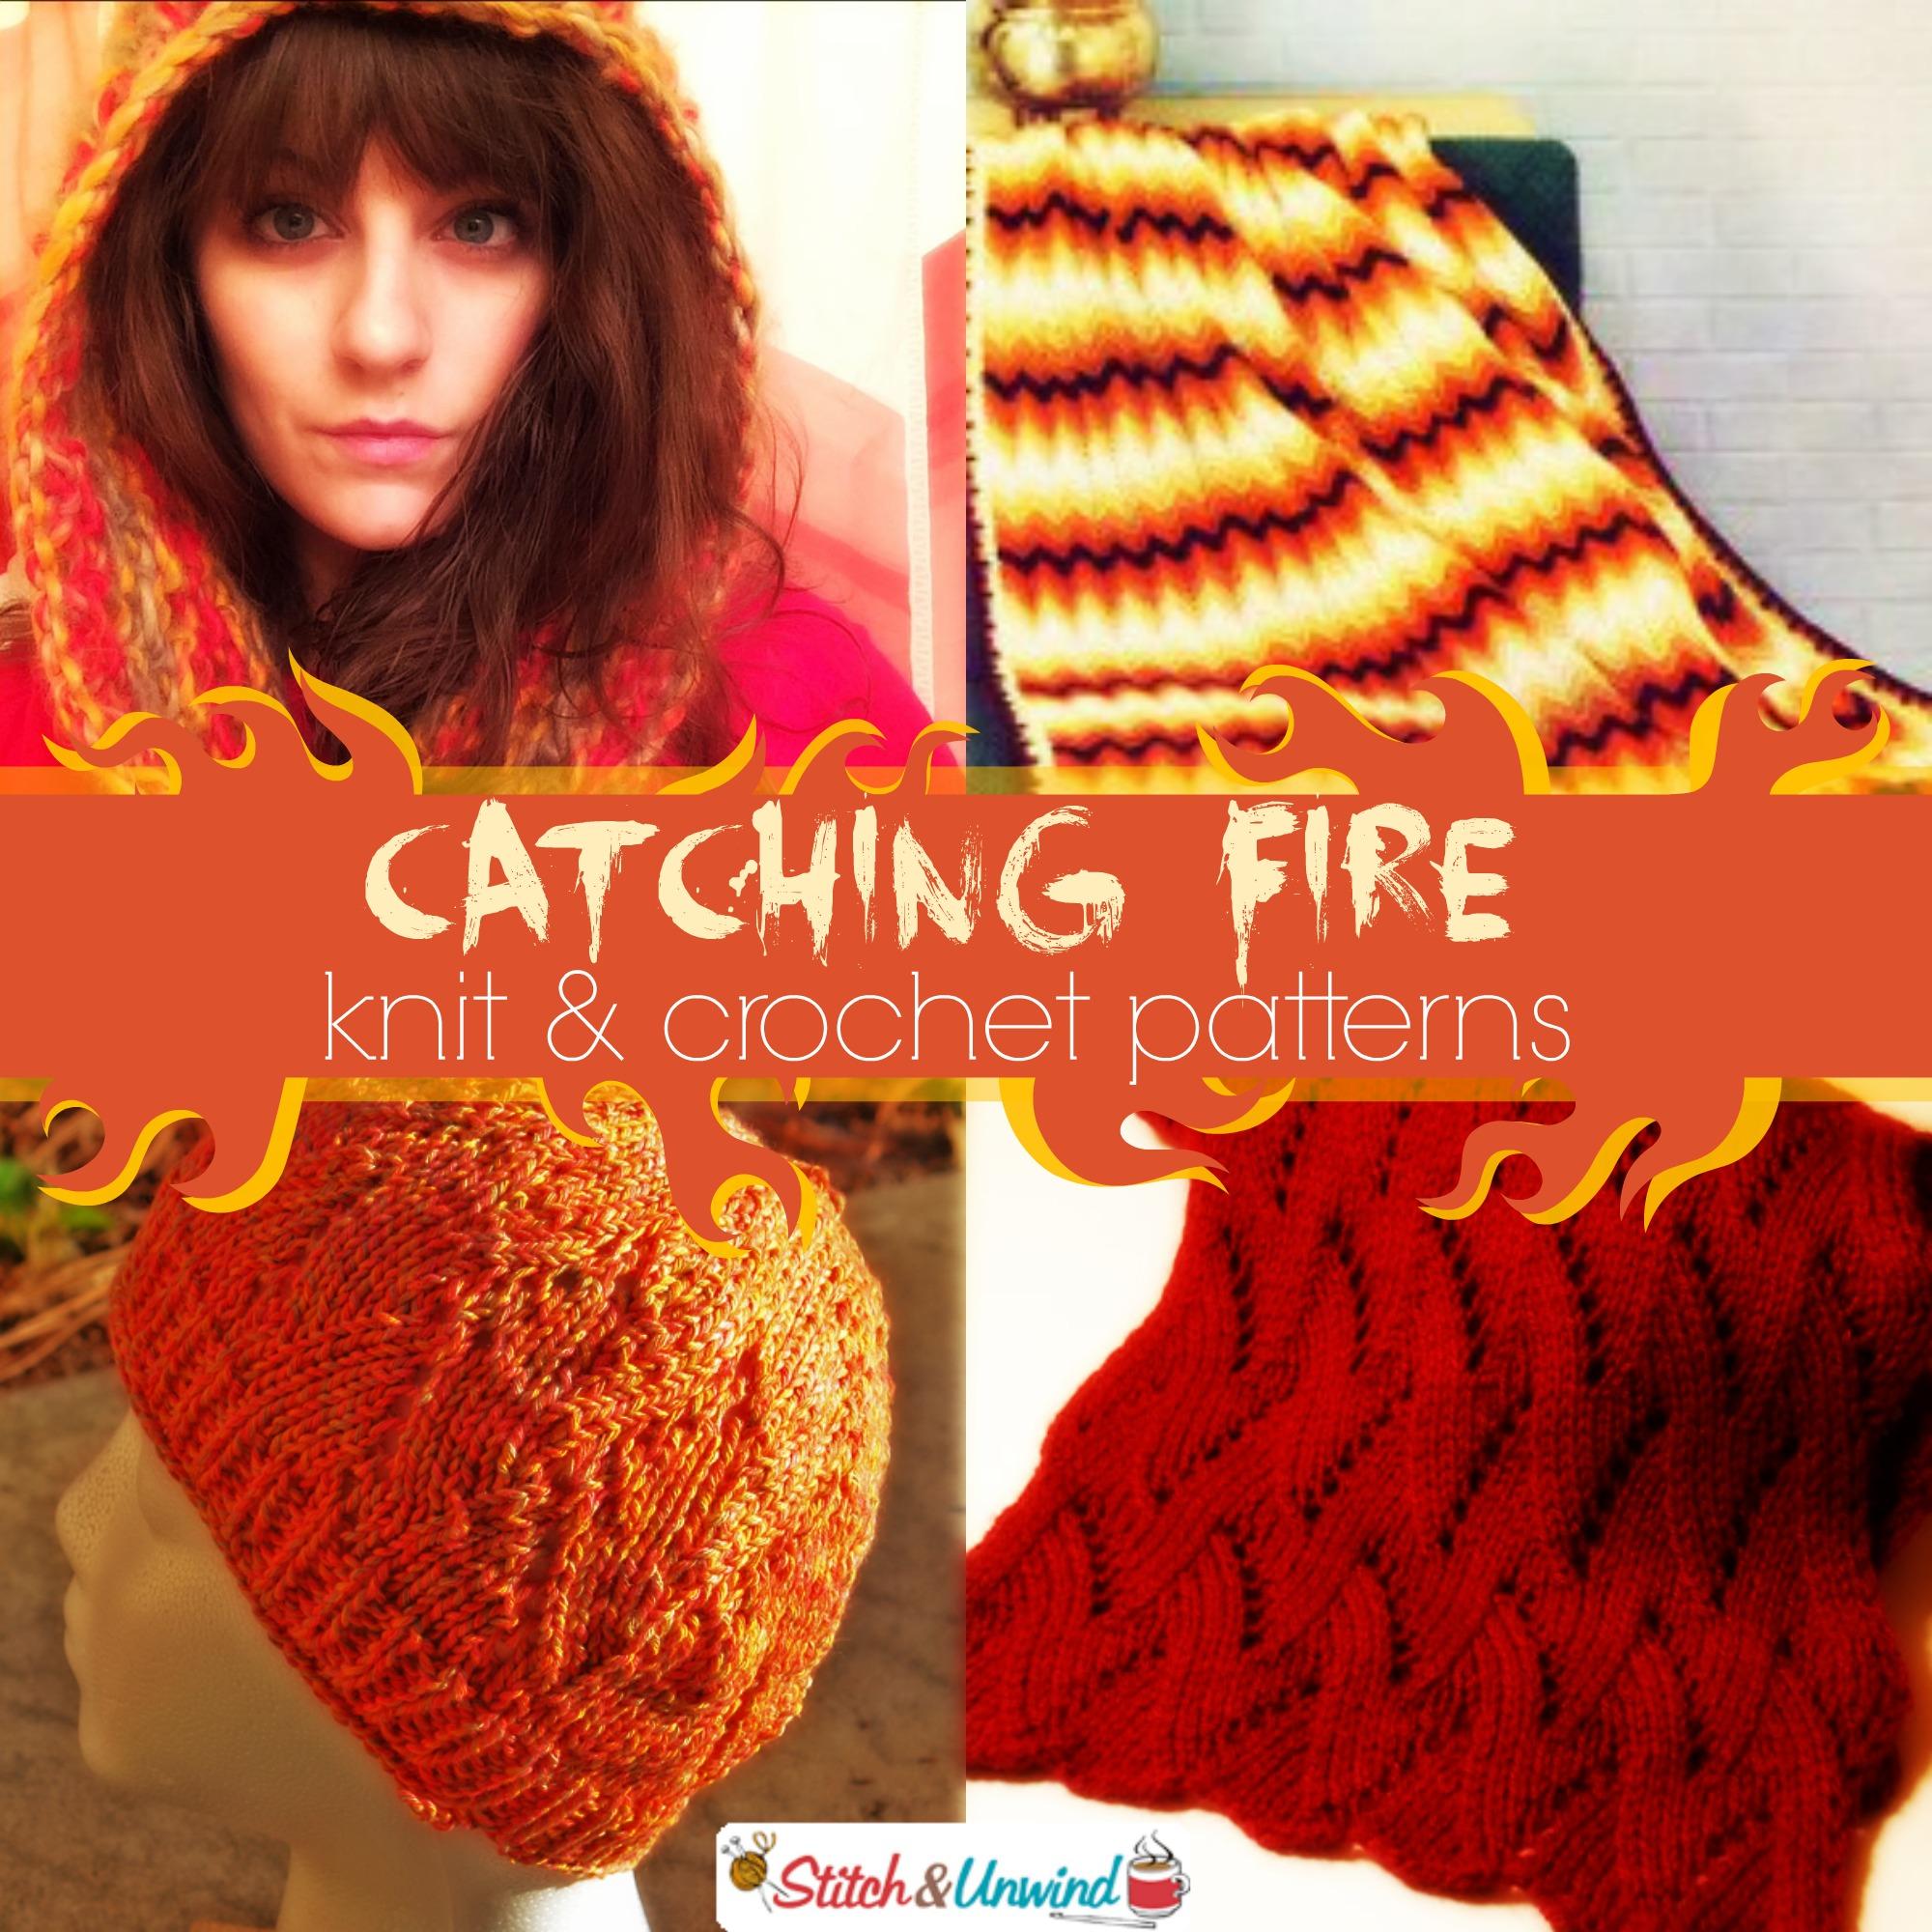 Catching Fire: Hot Knit & Crochet Patterns + Hunger Games - Stitch ...